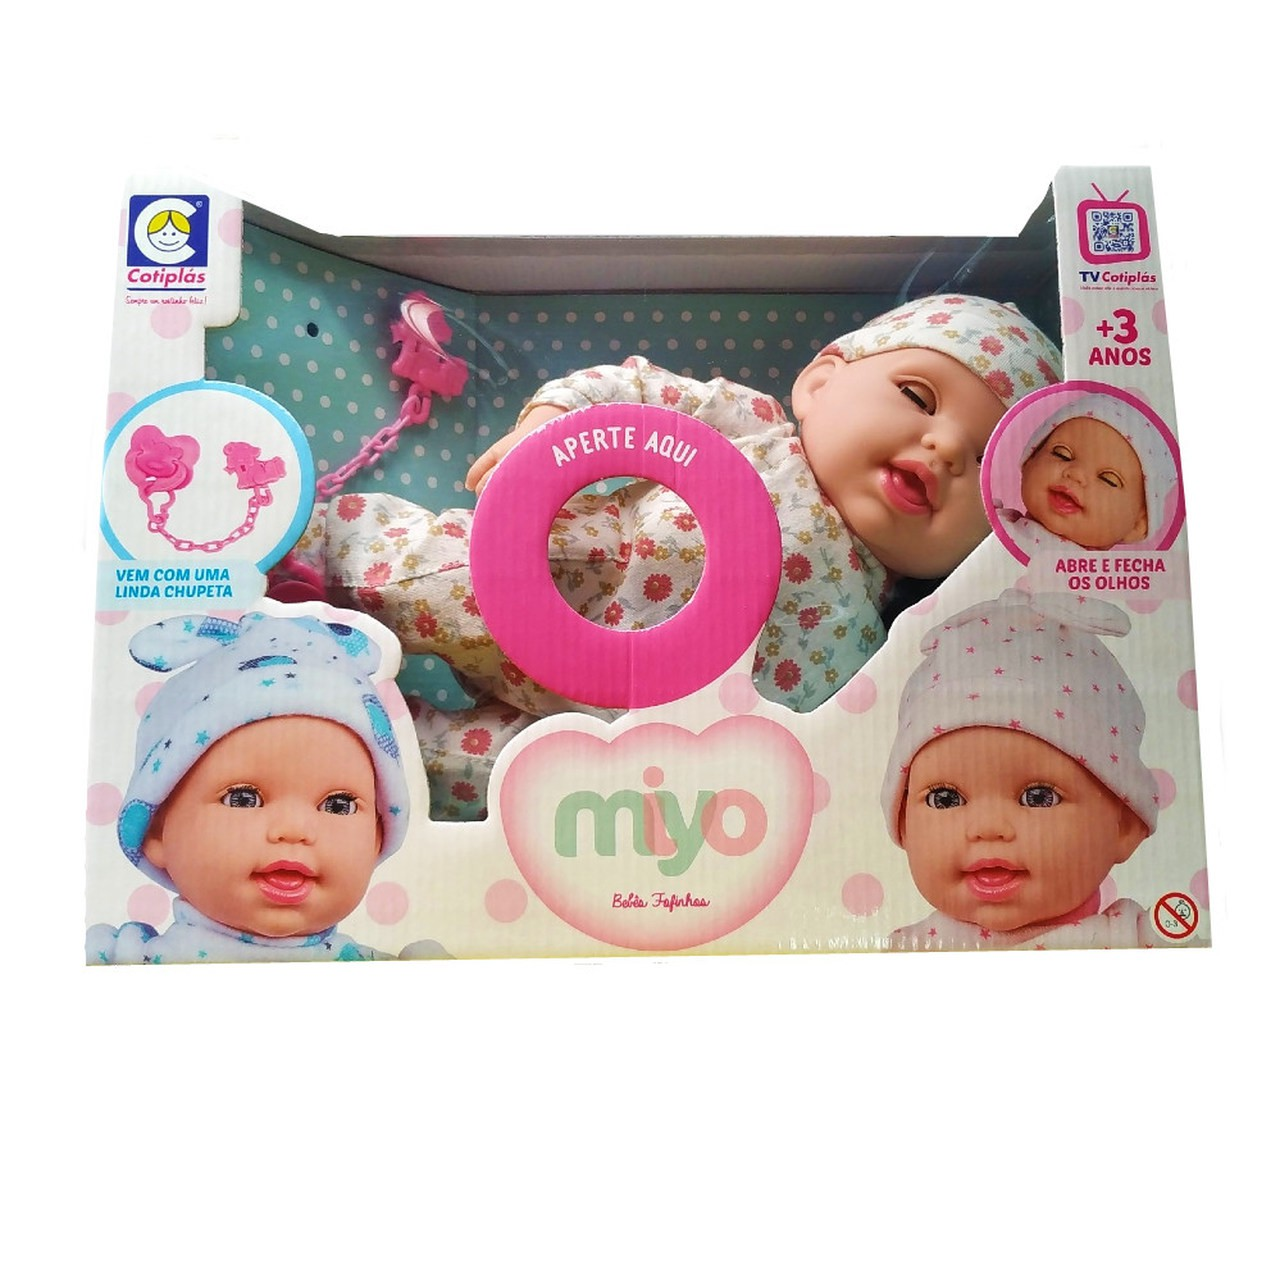 Boneco Bebê Miyo c/ Sons de Bebê Florzinha - Cotiplas 2391